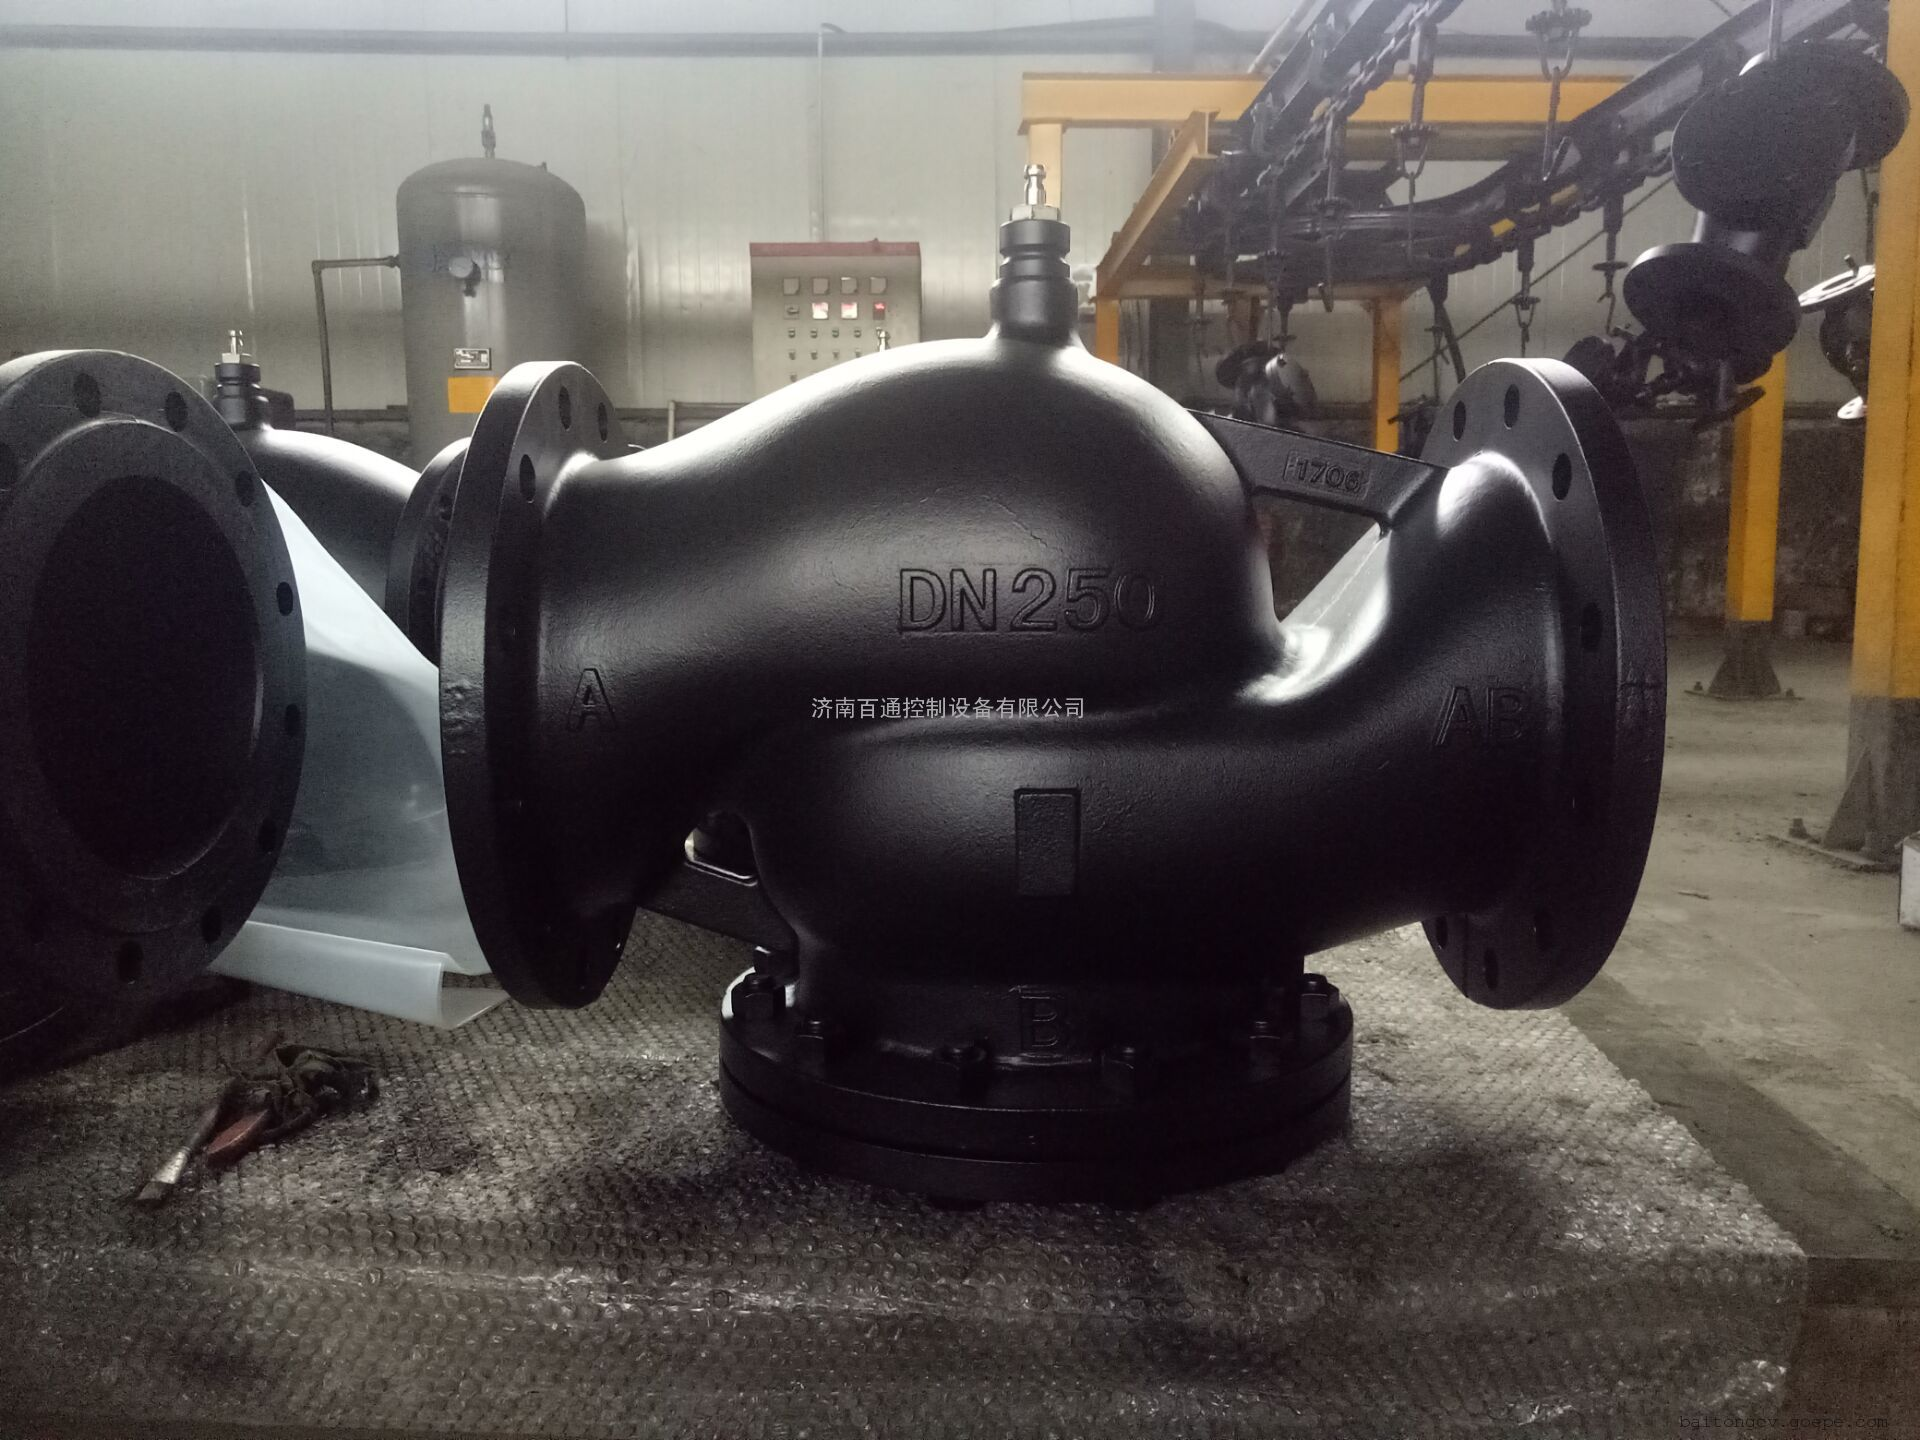 VVQT45.250 西门子电动调节阀 西门子混装阀 蒸汽阀